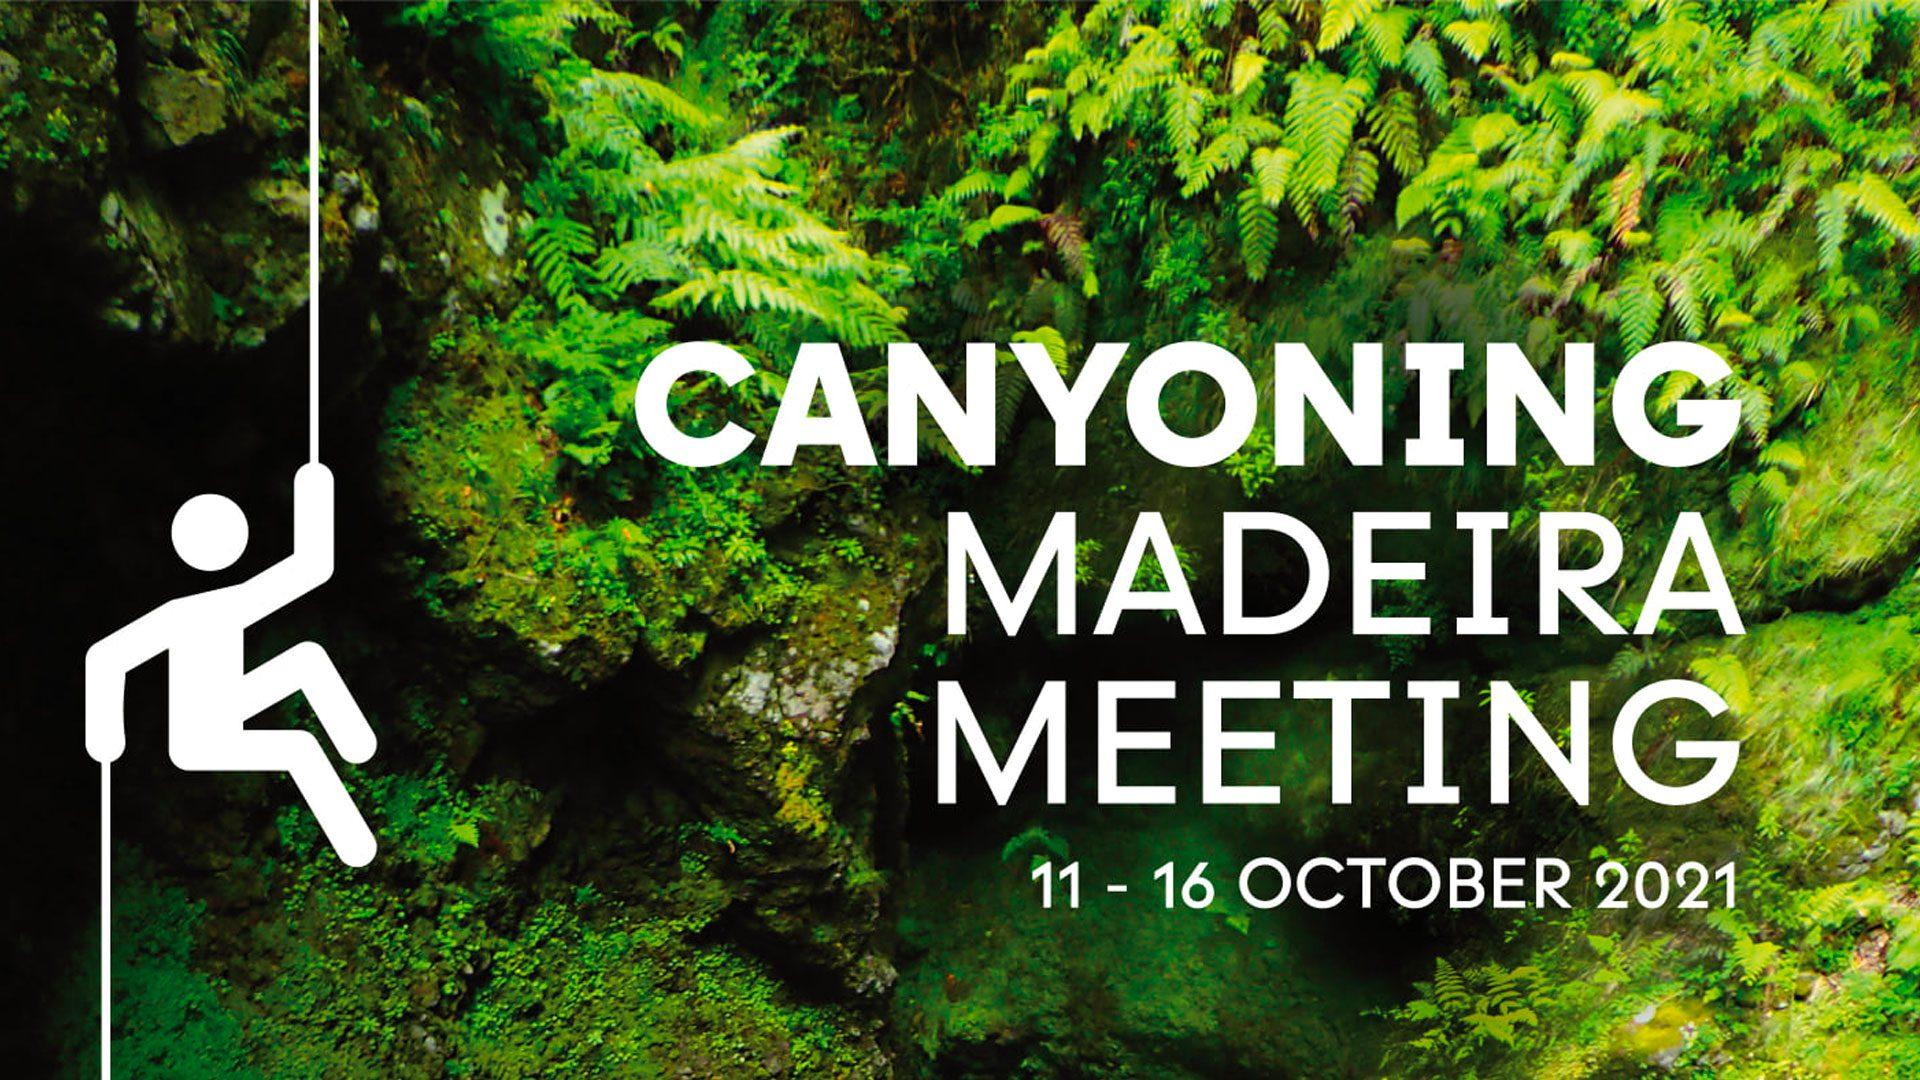 Madeira canyoning meeting 2021 facebook banner